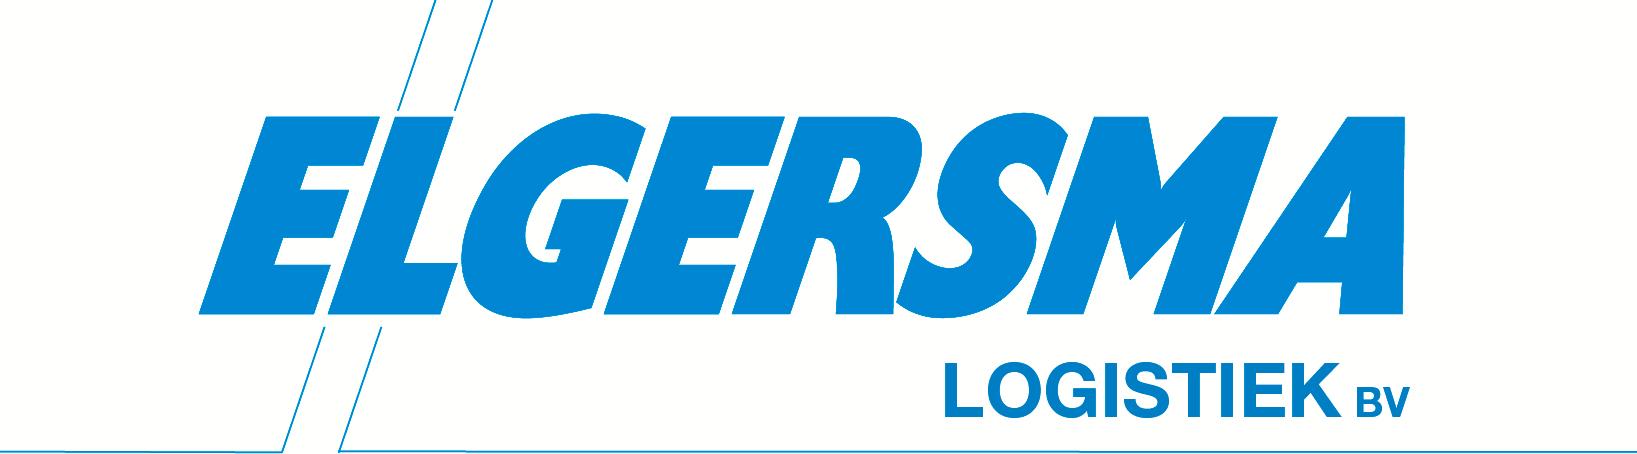 logo-elgersma-logistiek